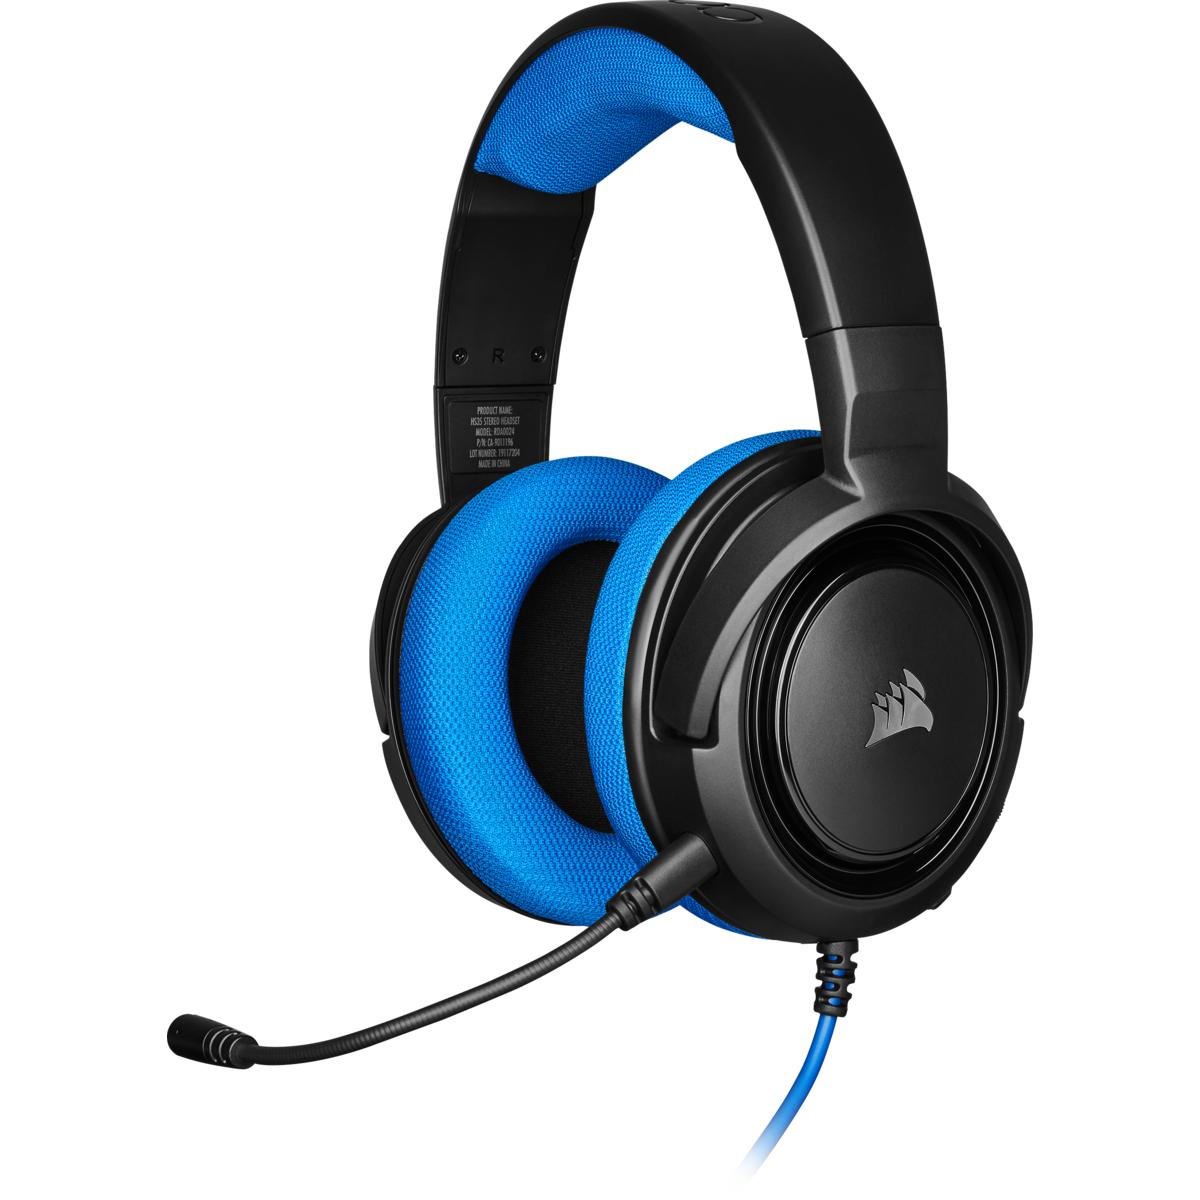 Stereo Gaming Headset Hs35 - Blue (eu)